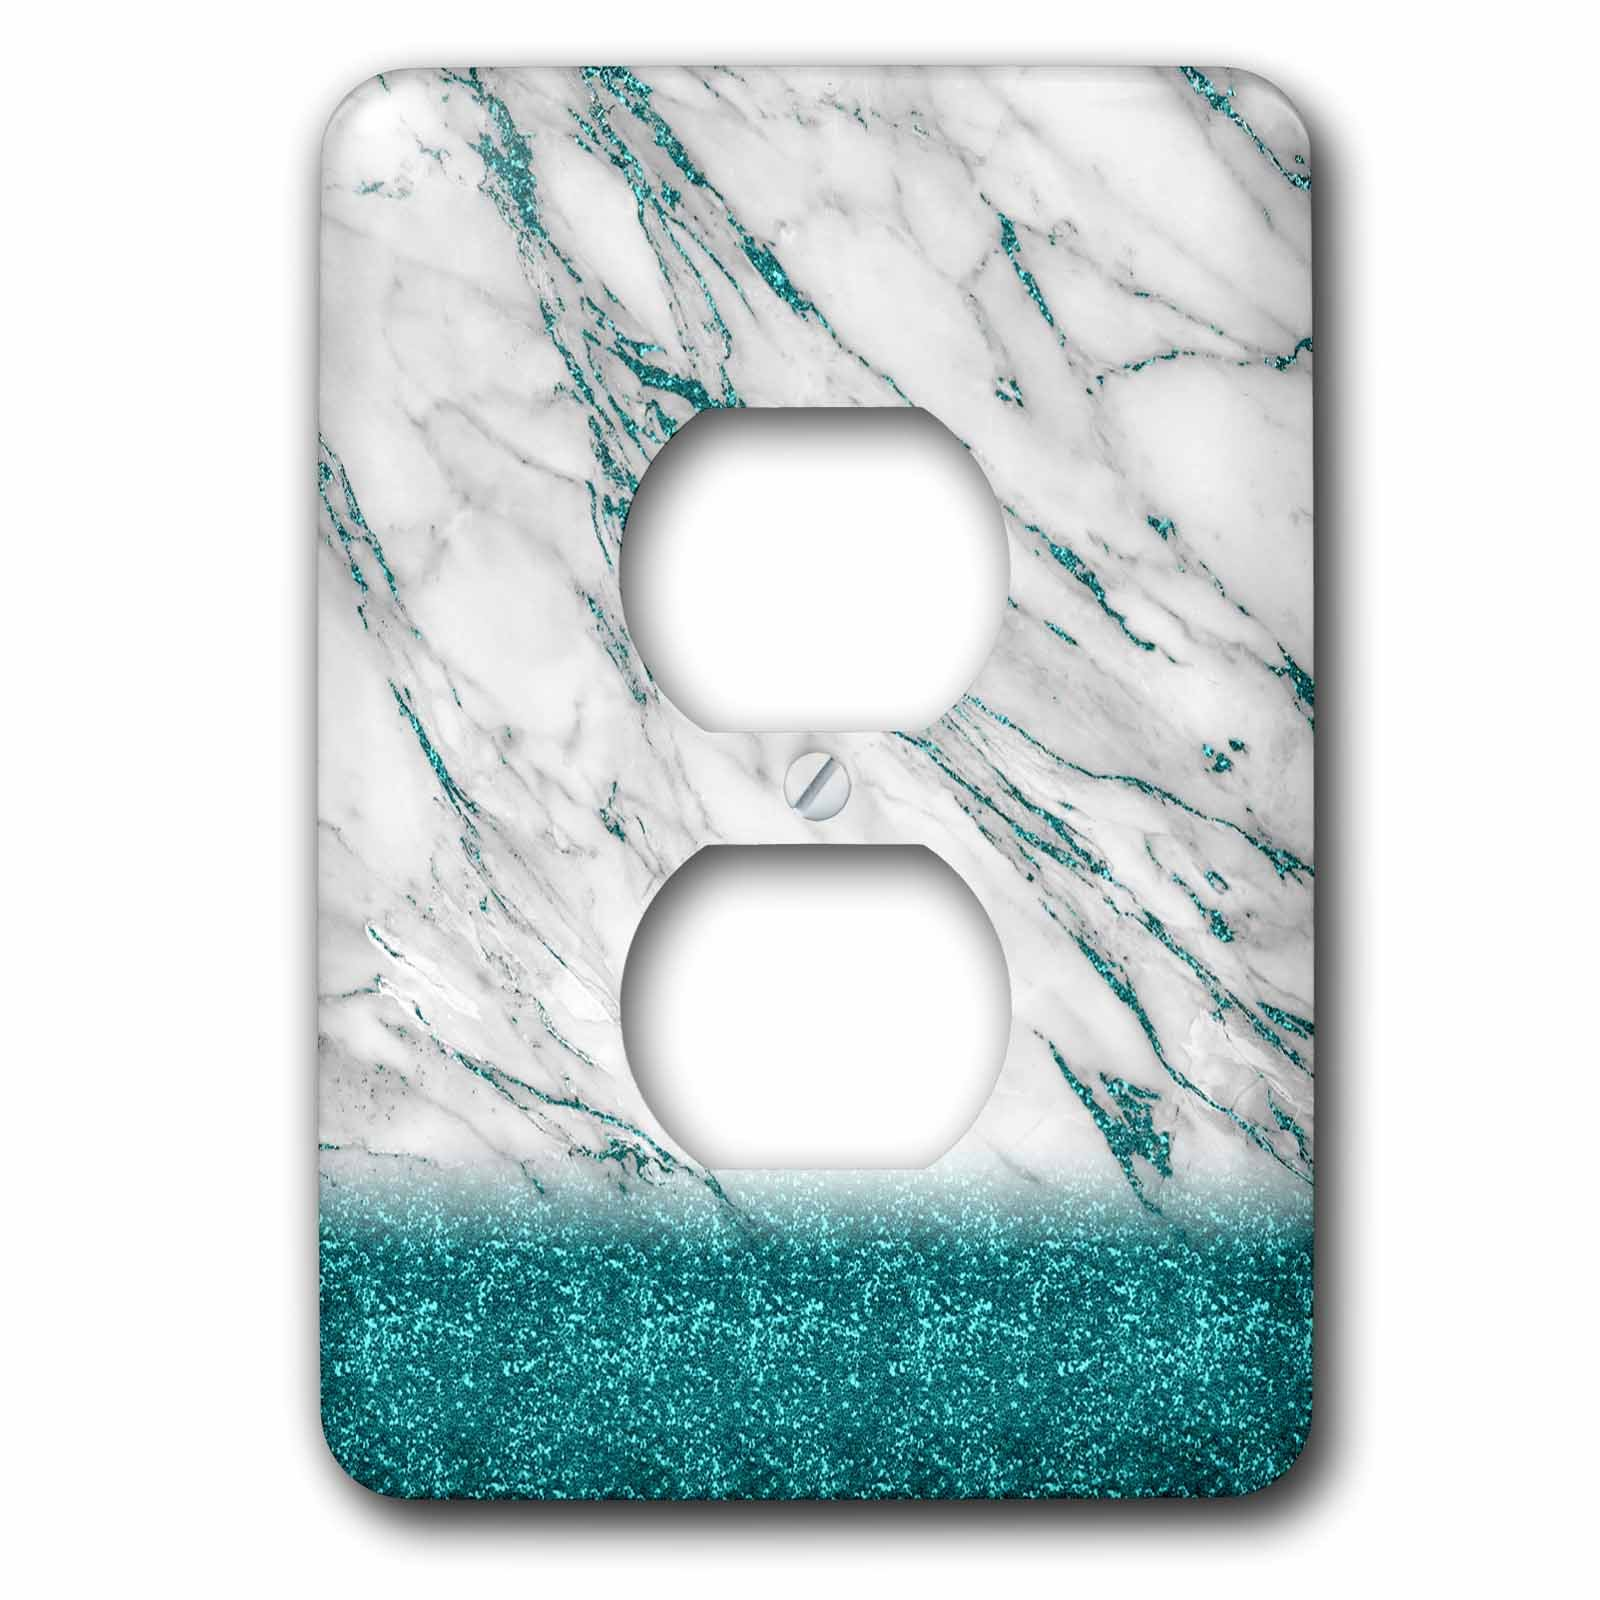 3dRose Uta Naumann Faux Glitter Pattern - Luxury Grey Aqua Teal Gem Stone Marble Glitter Metallic Faux Print - Light Switch Covers - 2 plug outlet cover (lsp_268849_6)